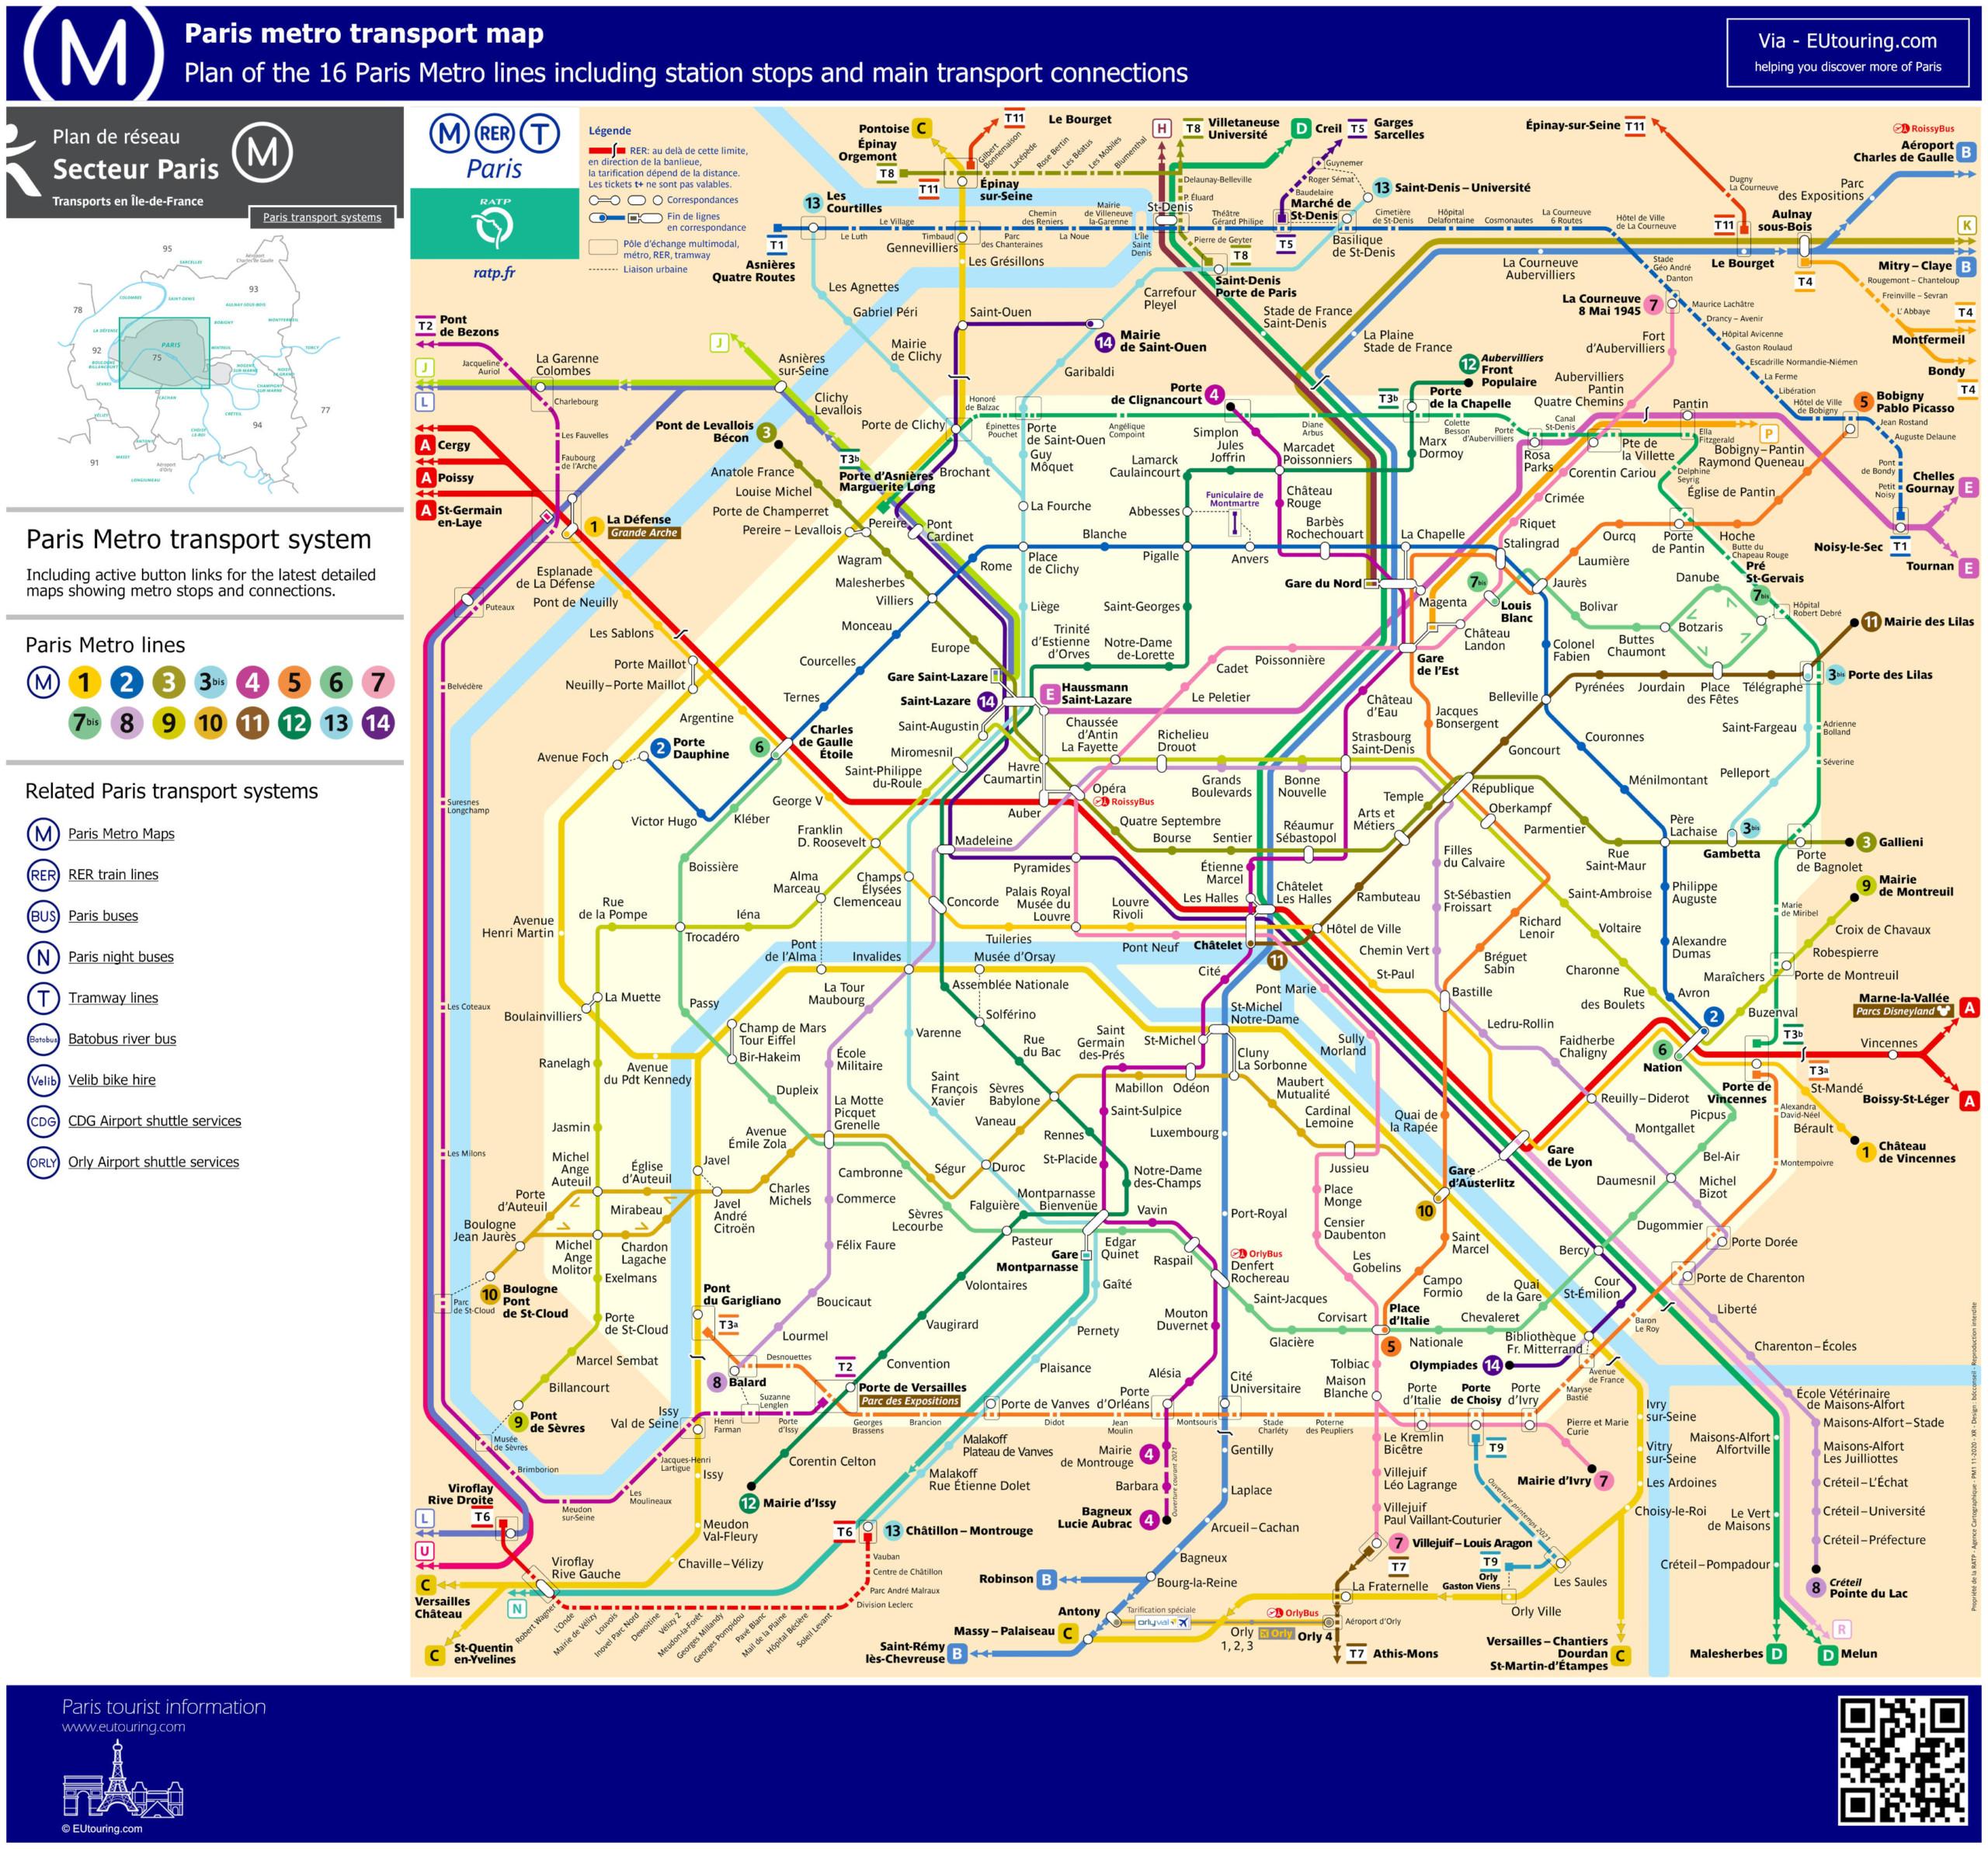 Paris Metro Maps Plus 16 Metro Lines With Stations